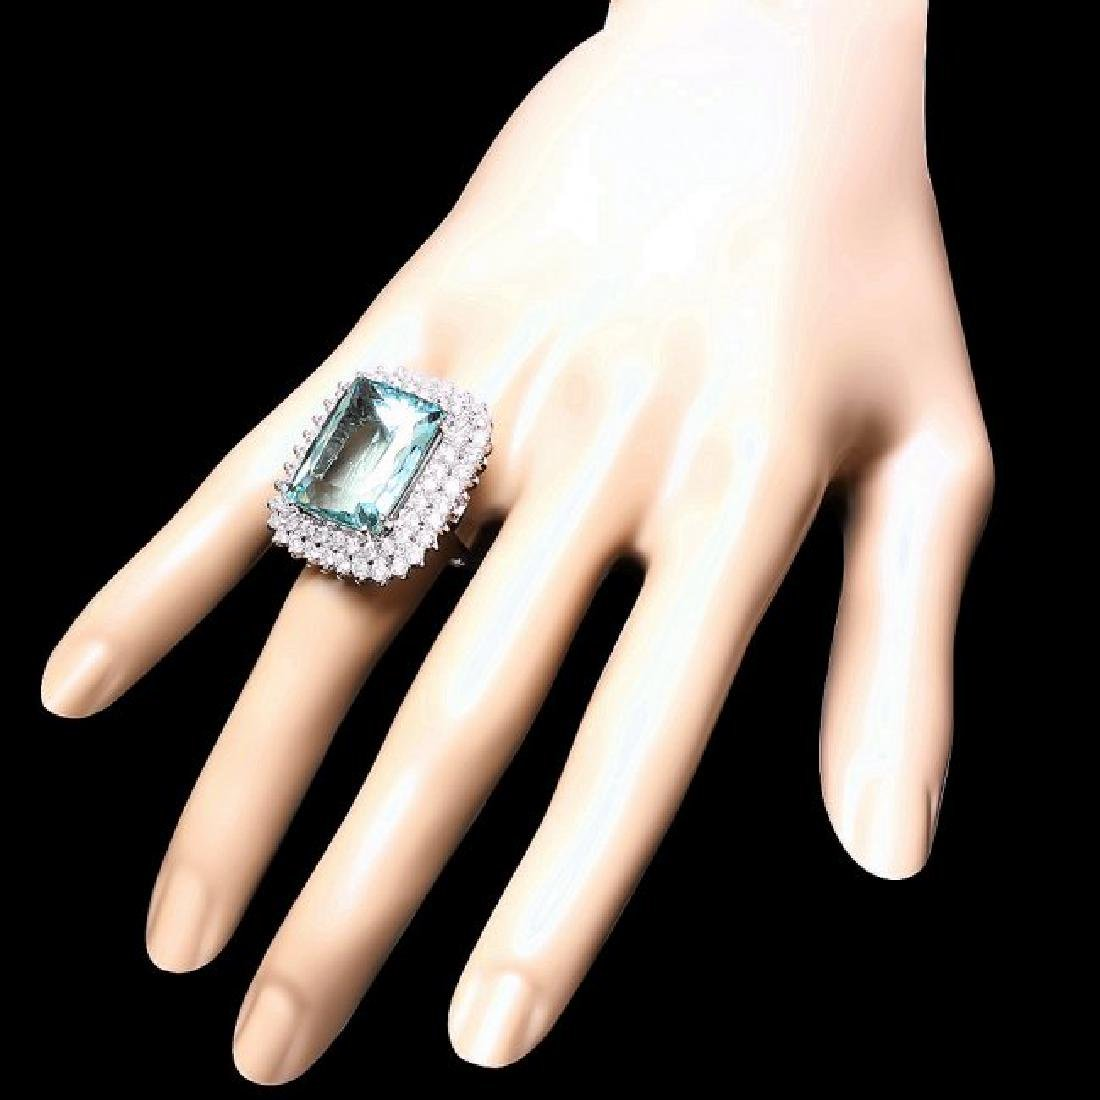 14k Gold 21.00ct Aquamarine 3.00ct Diamond Ring - 3